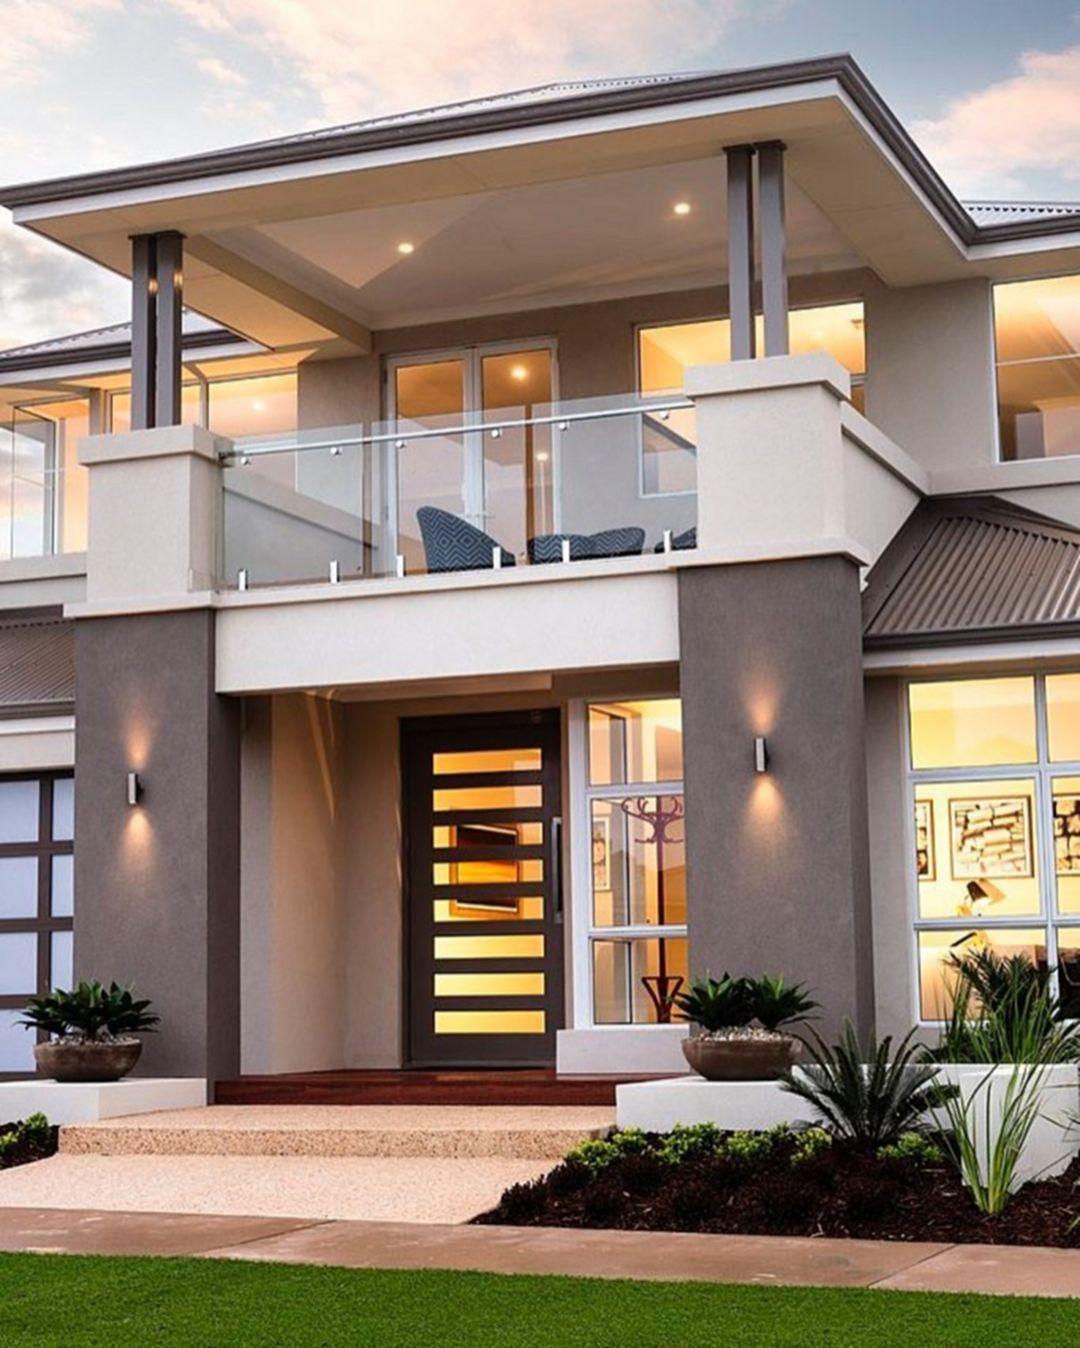 25 Fantastic Luxury Modern House Design Ideas For Live Better Minimalist House Design Facade House House Designs Exterior